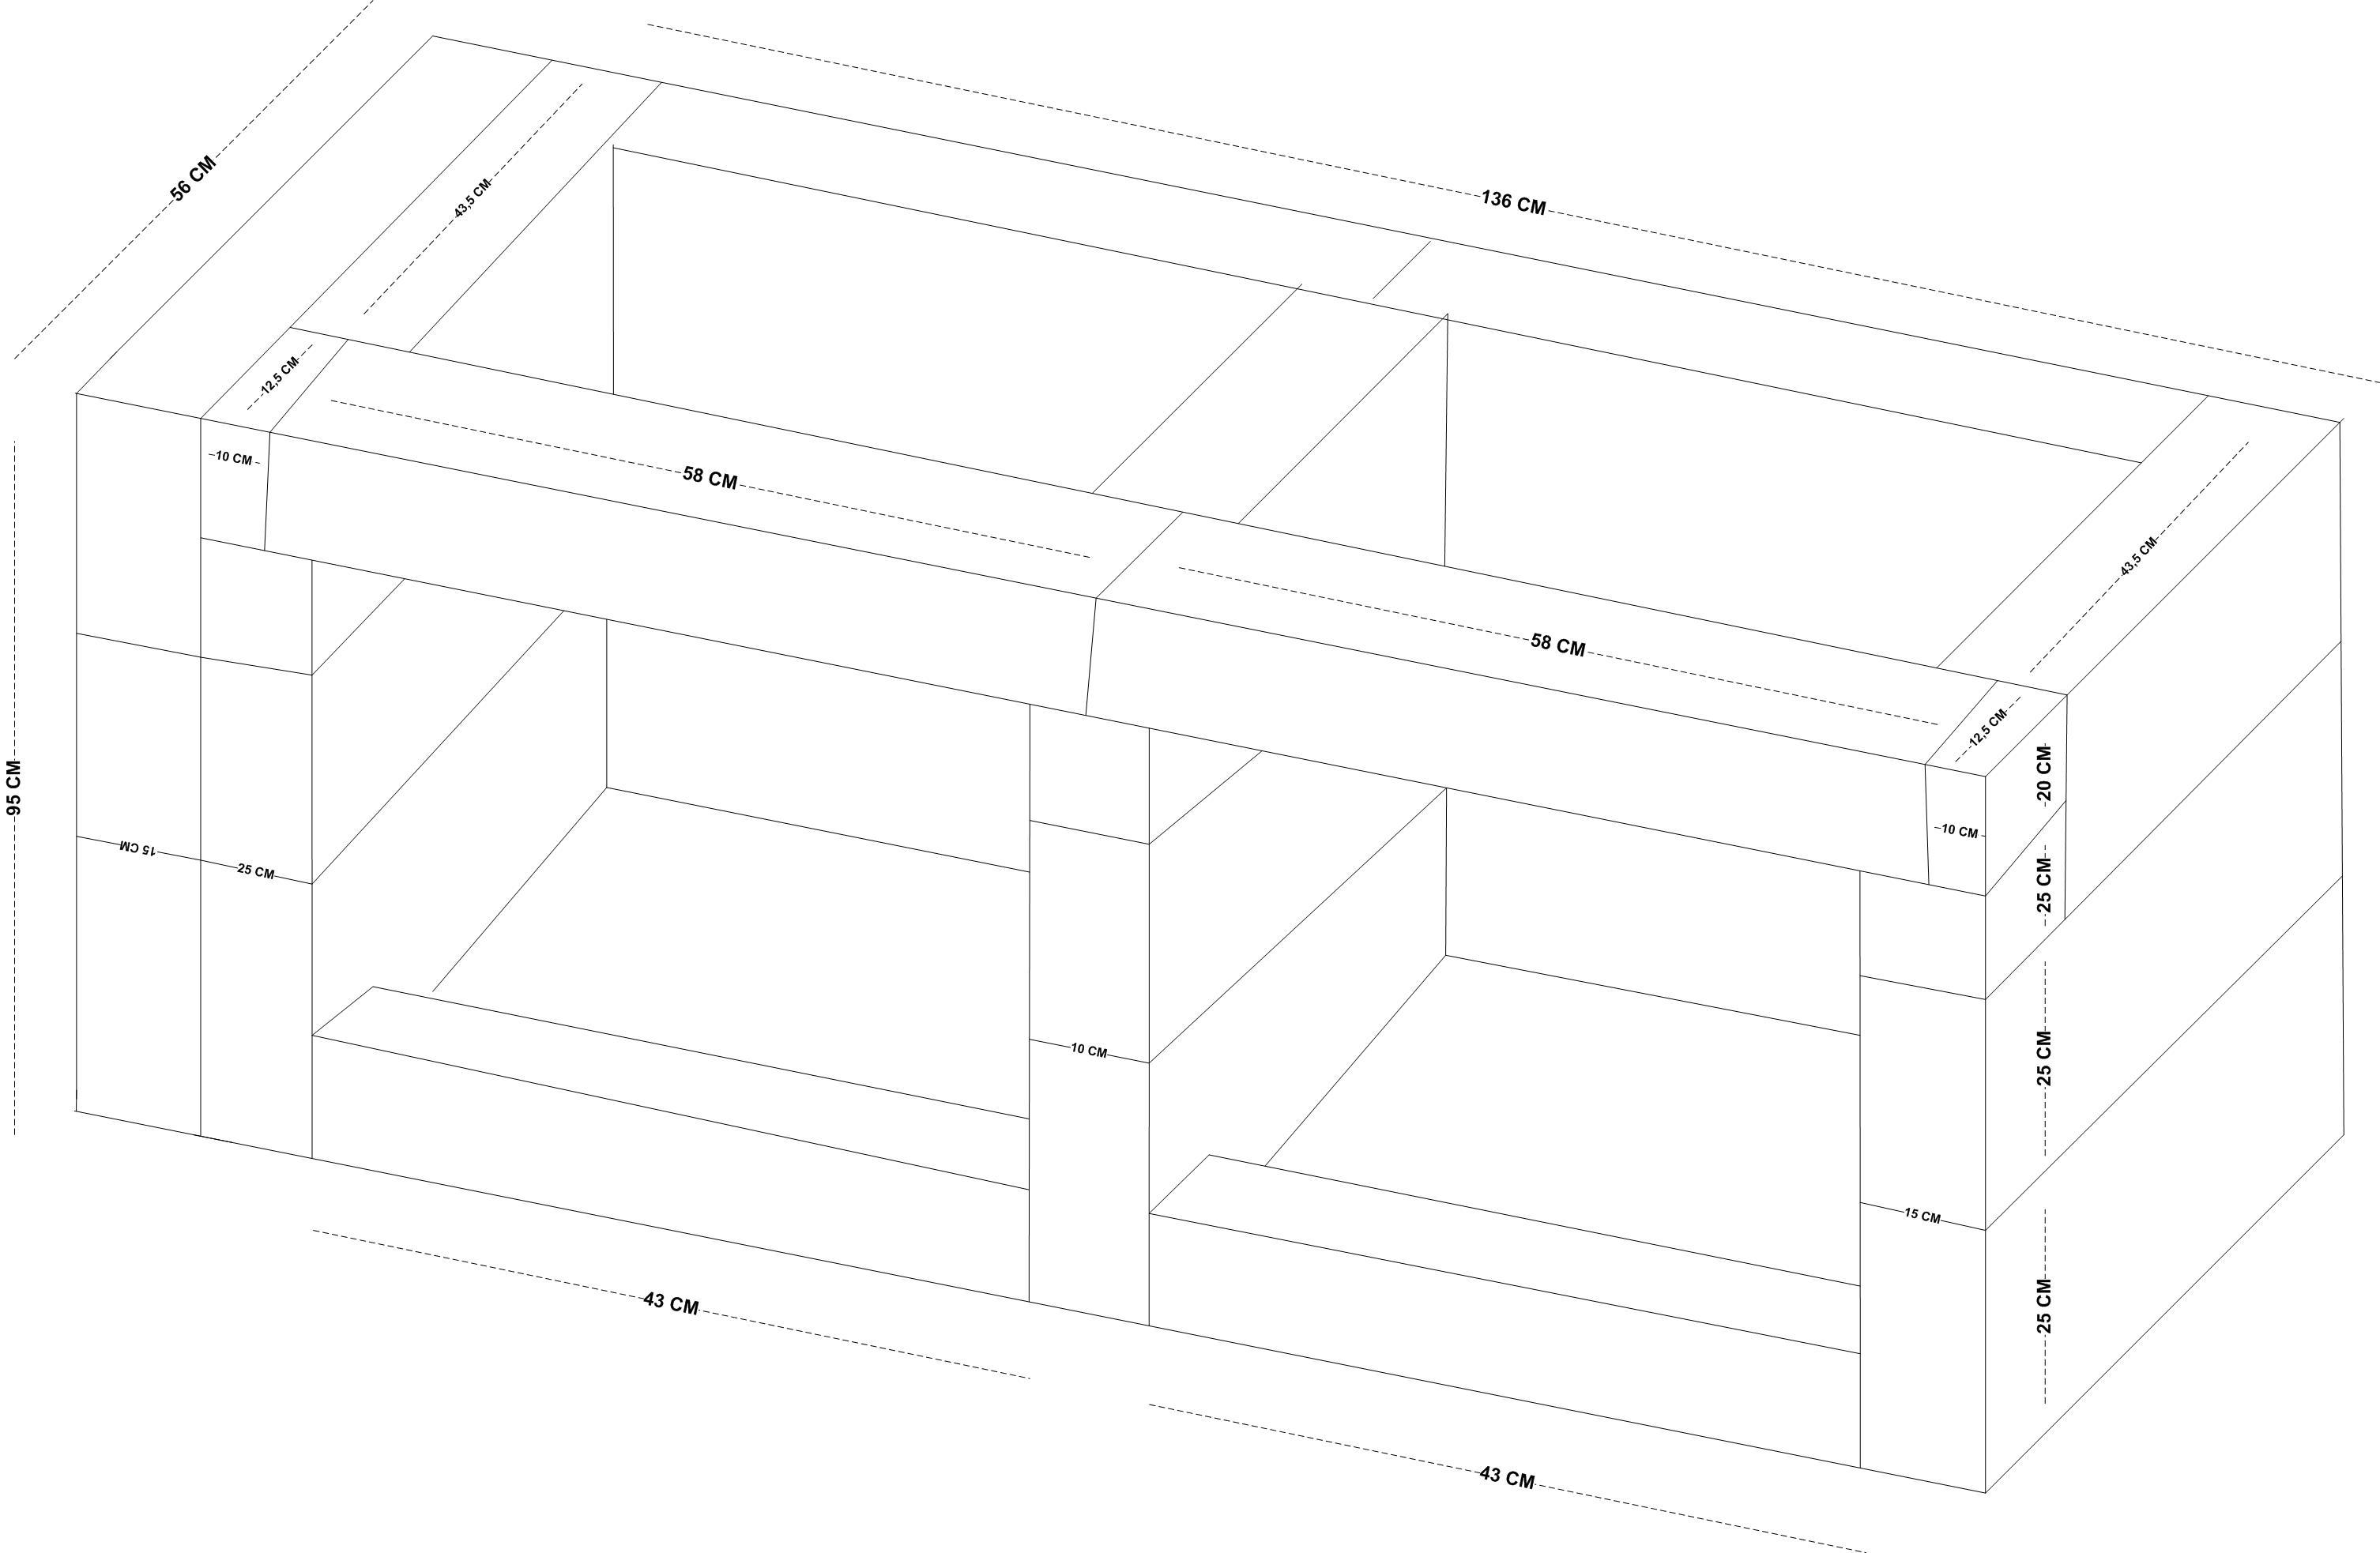 poids aquarium sur carrelage. Black Bedroom Furniture Sets. Home Design Ideas